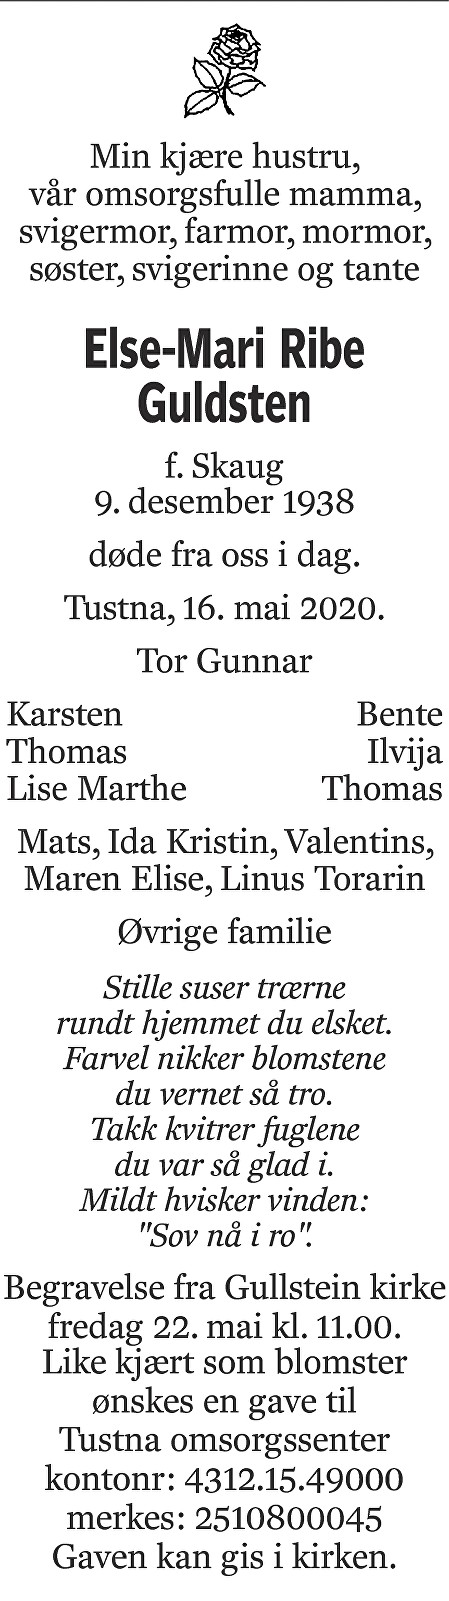 Else-Mari Ribe Guldsten Dødsannonse